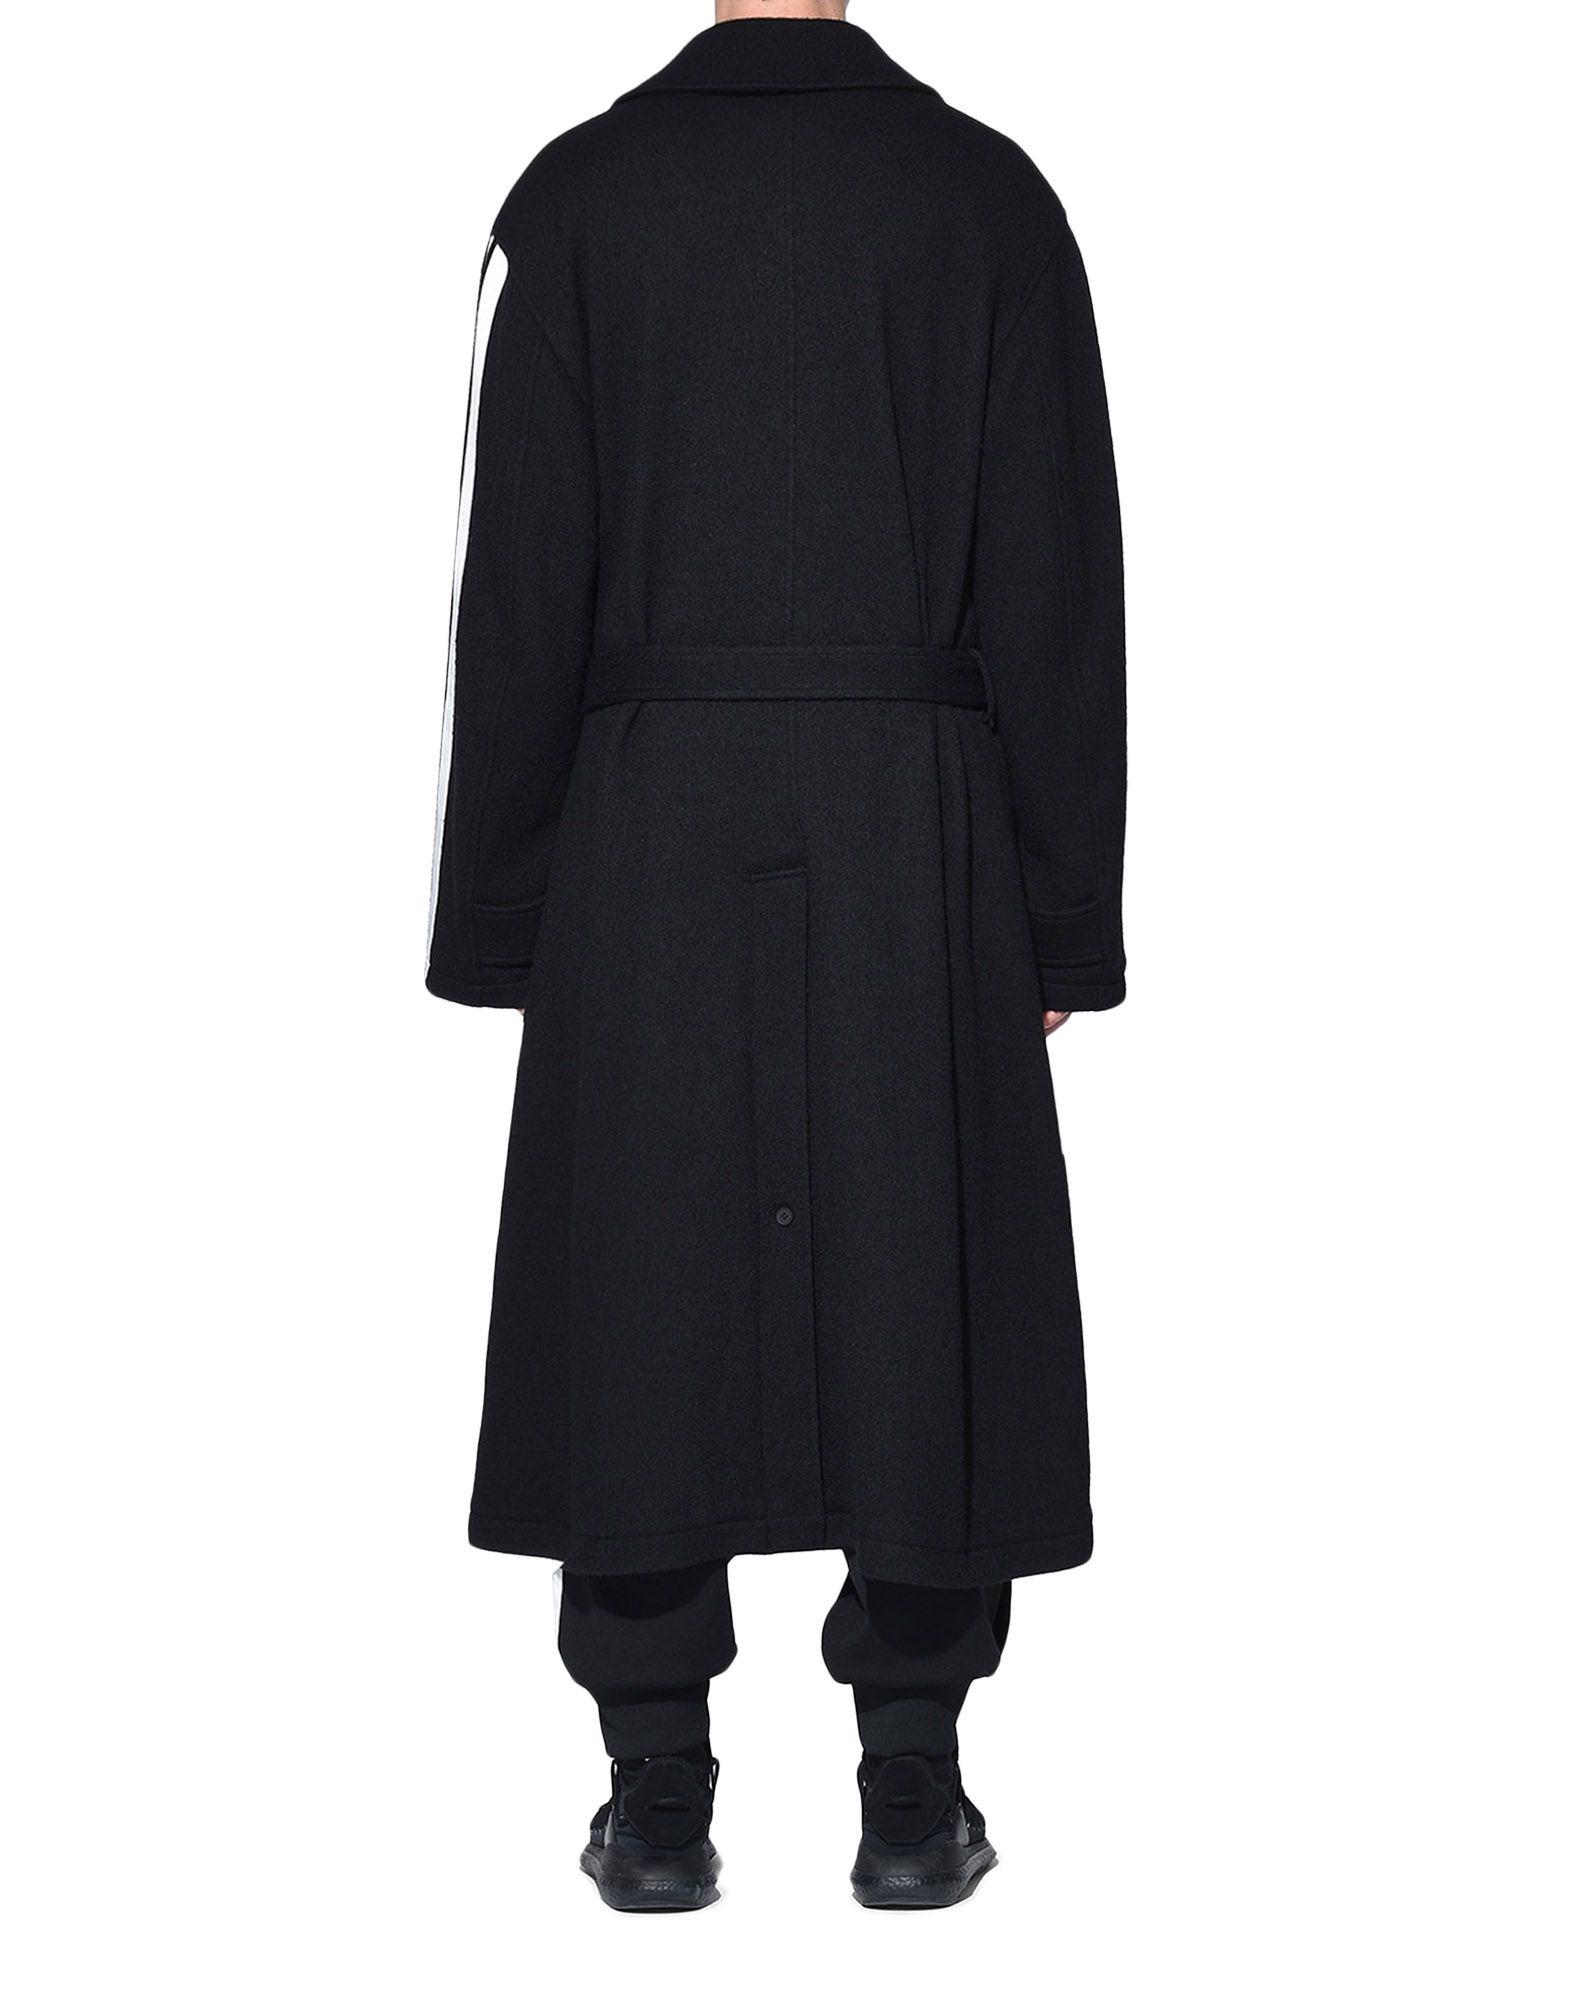 Y-3 Y-3 Tailored Wool Coat Coat Man d